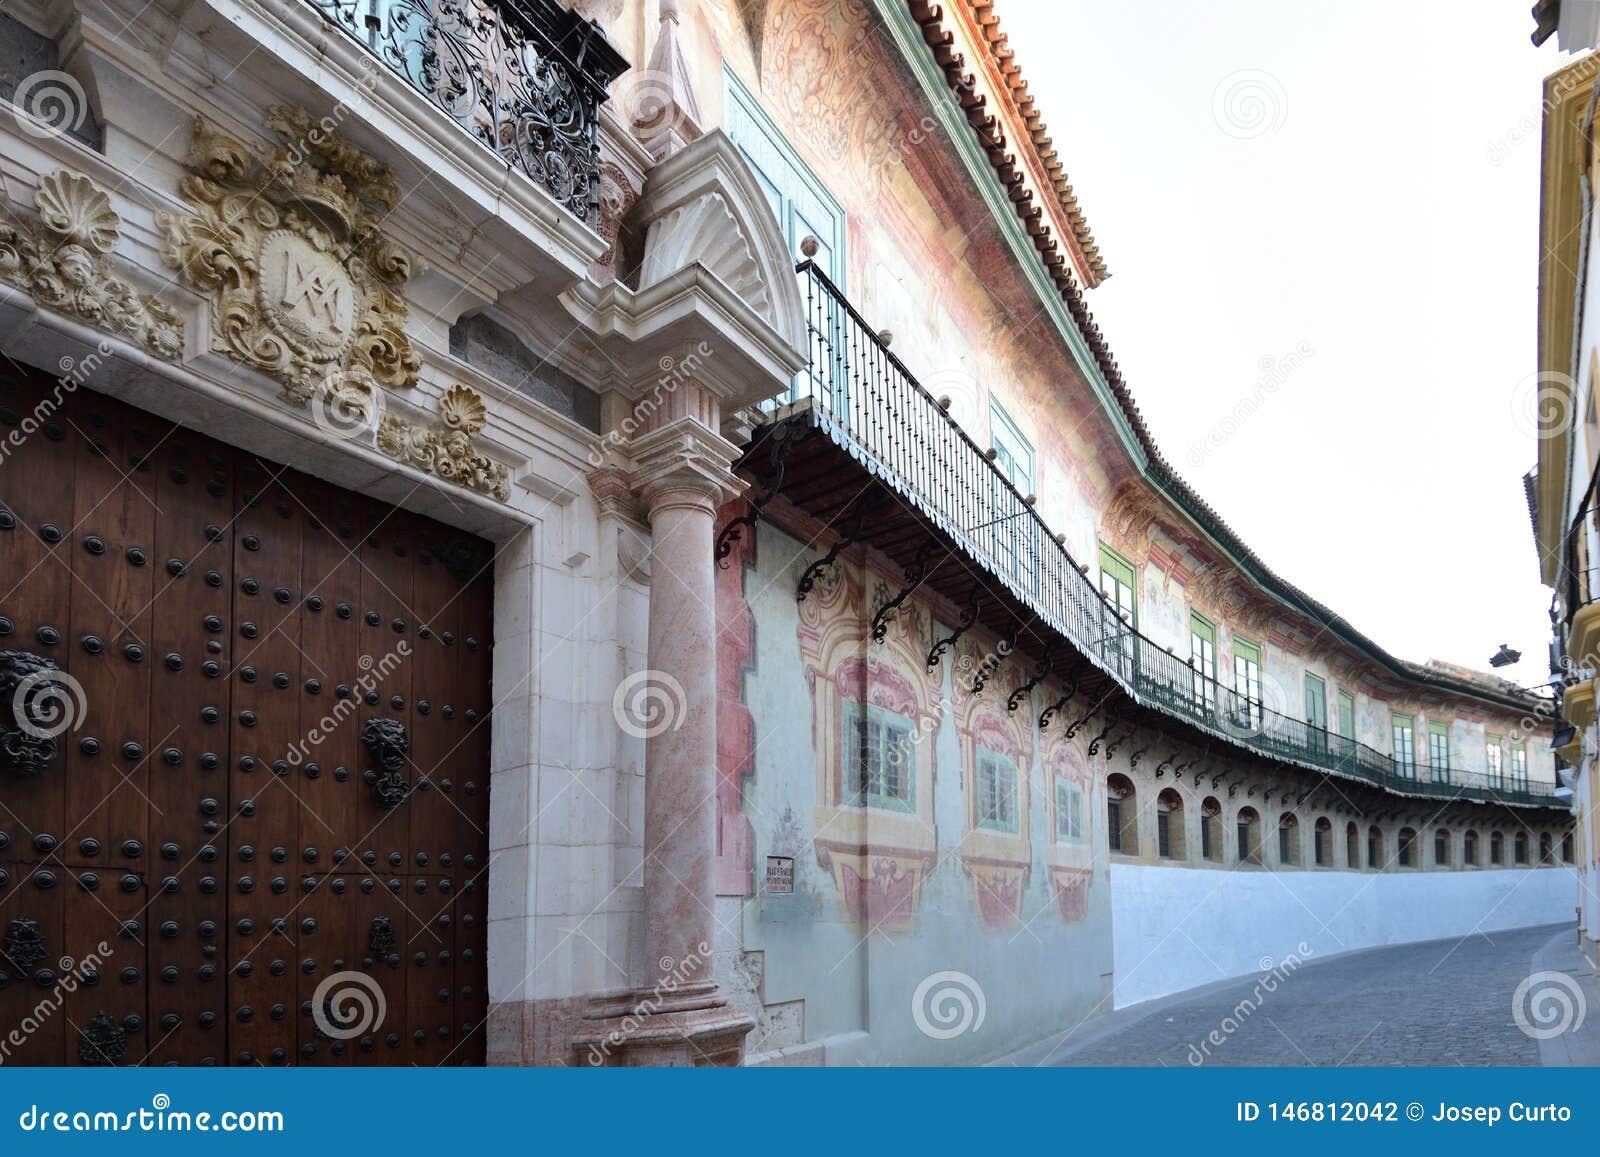 Caballeros ulicy, pałac Peñaflor, Ecija, Sevilla prowincja, Andalusia, Hiszpania